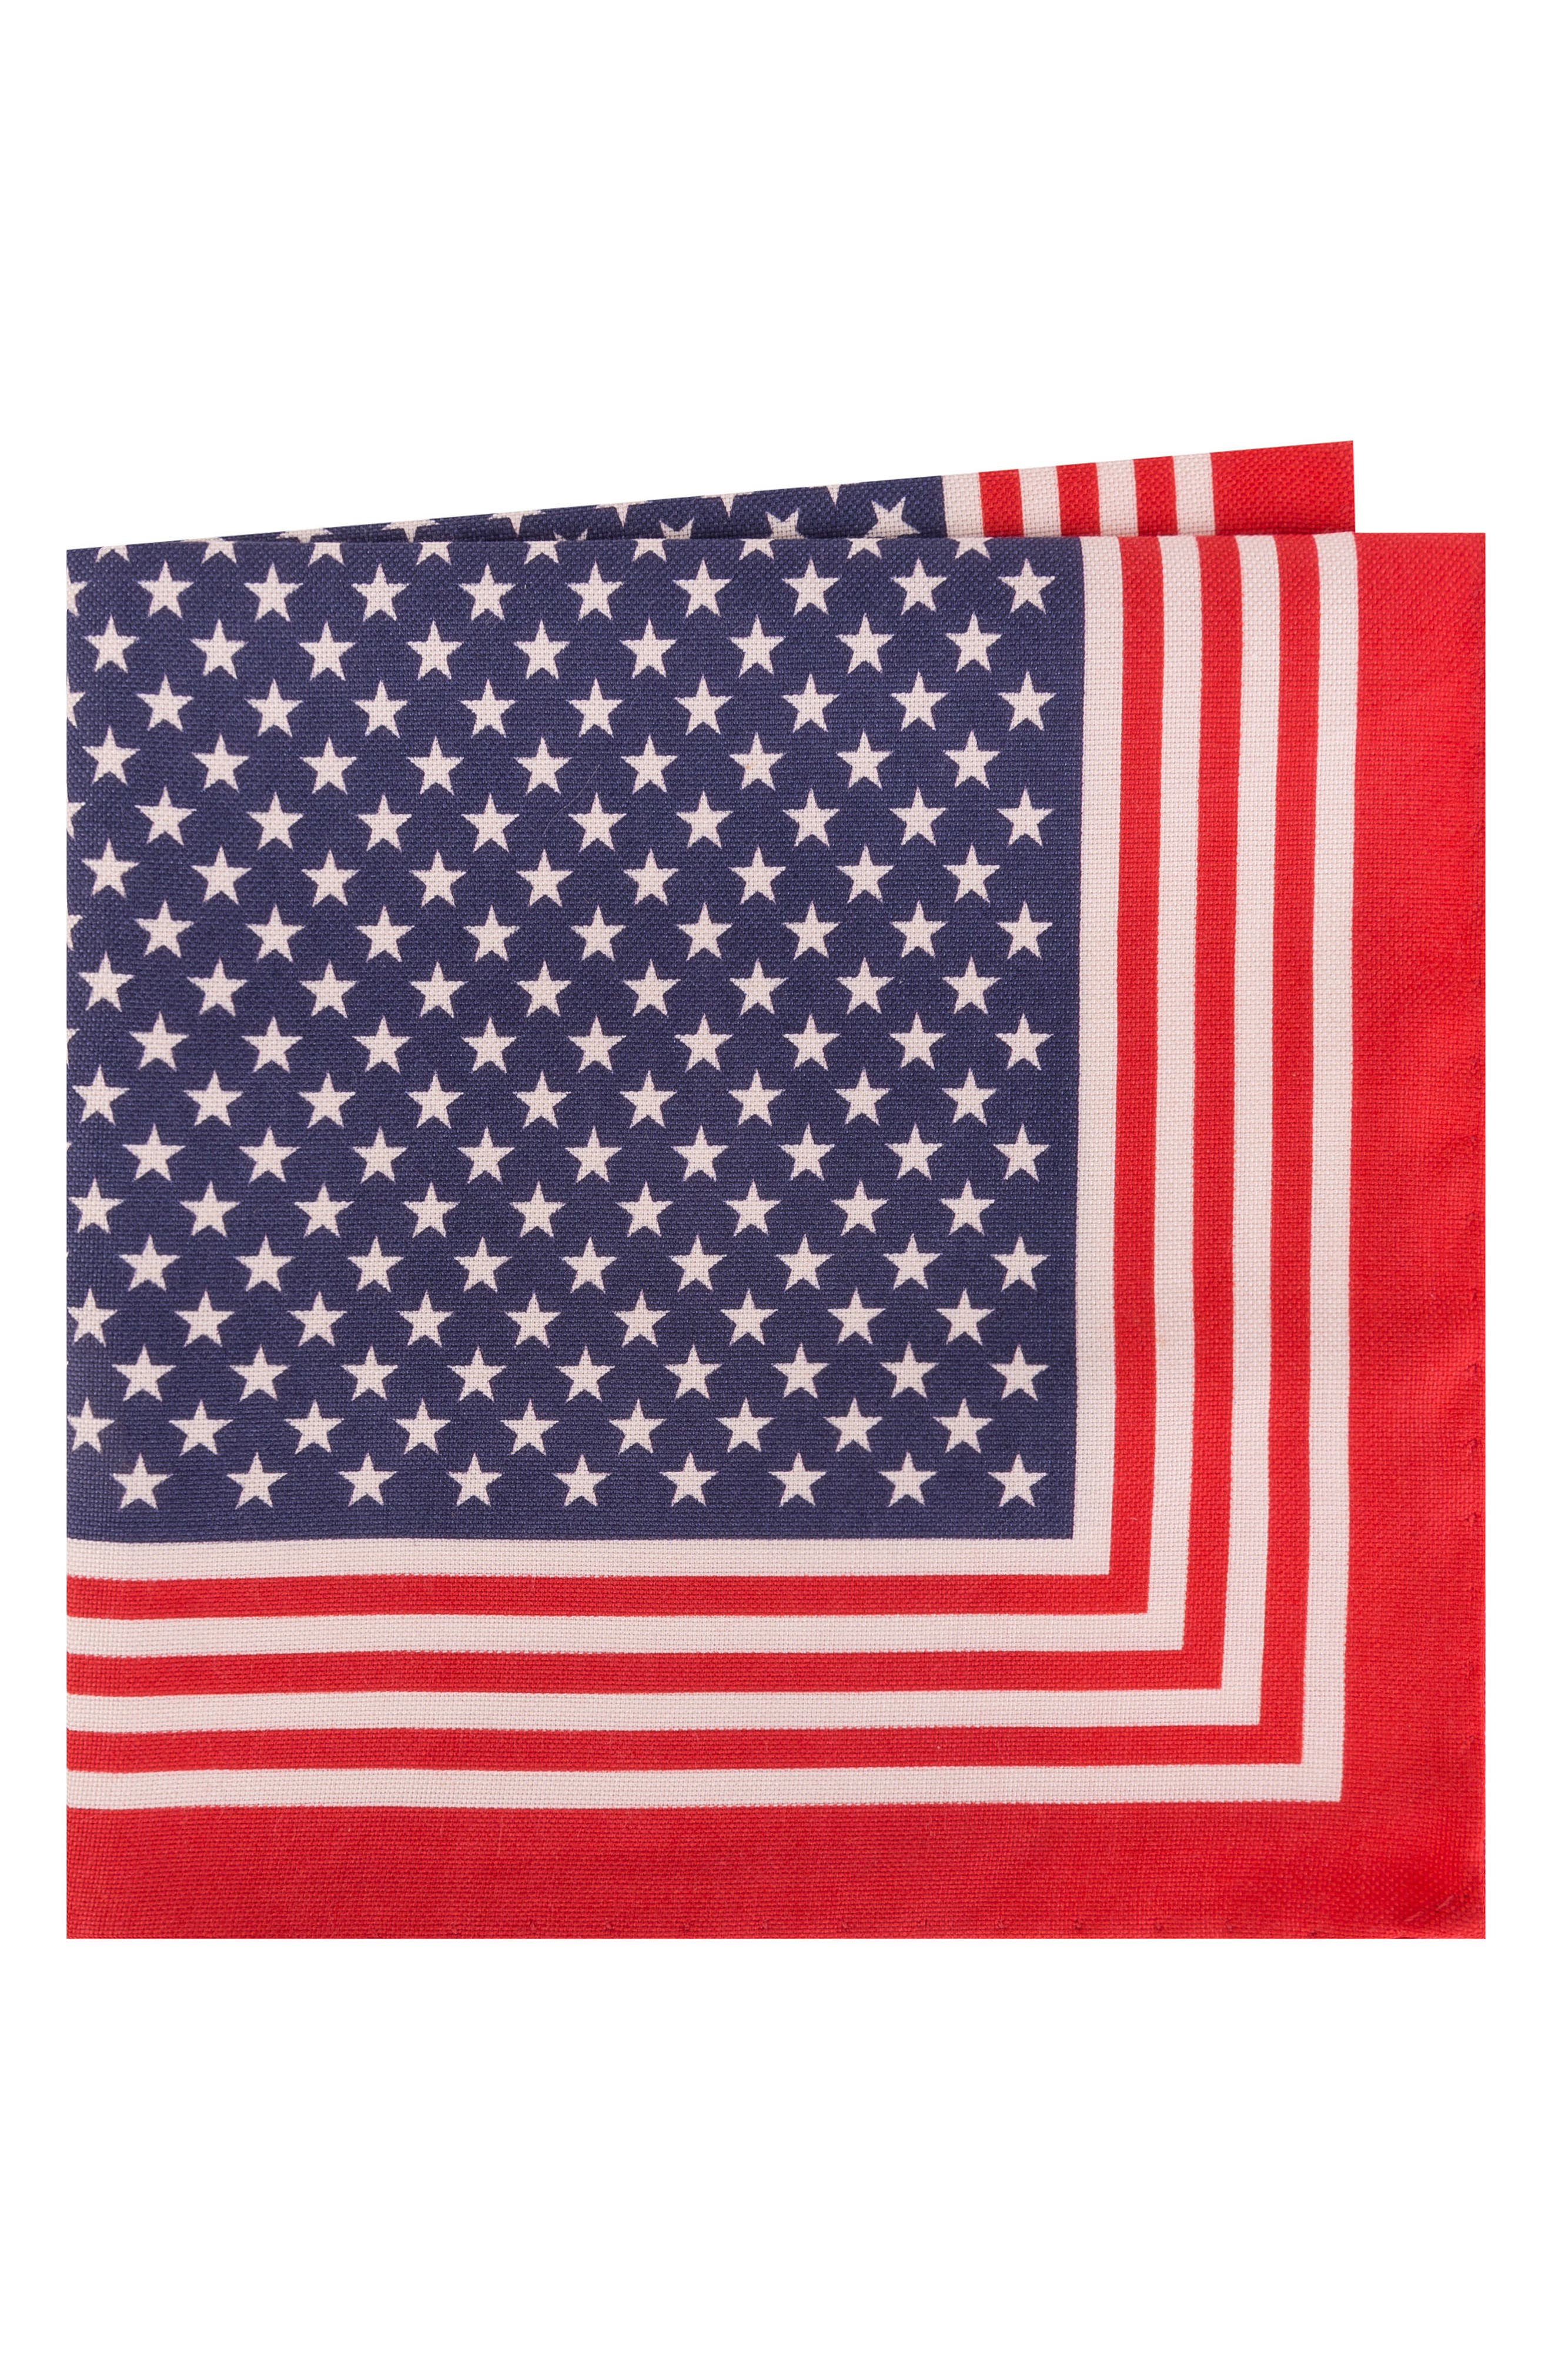 Stars & Stripes Cotton & Silk Pocket Square,                         Main,                         color, Red/ Blue